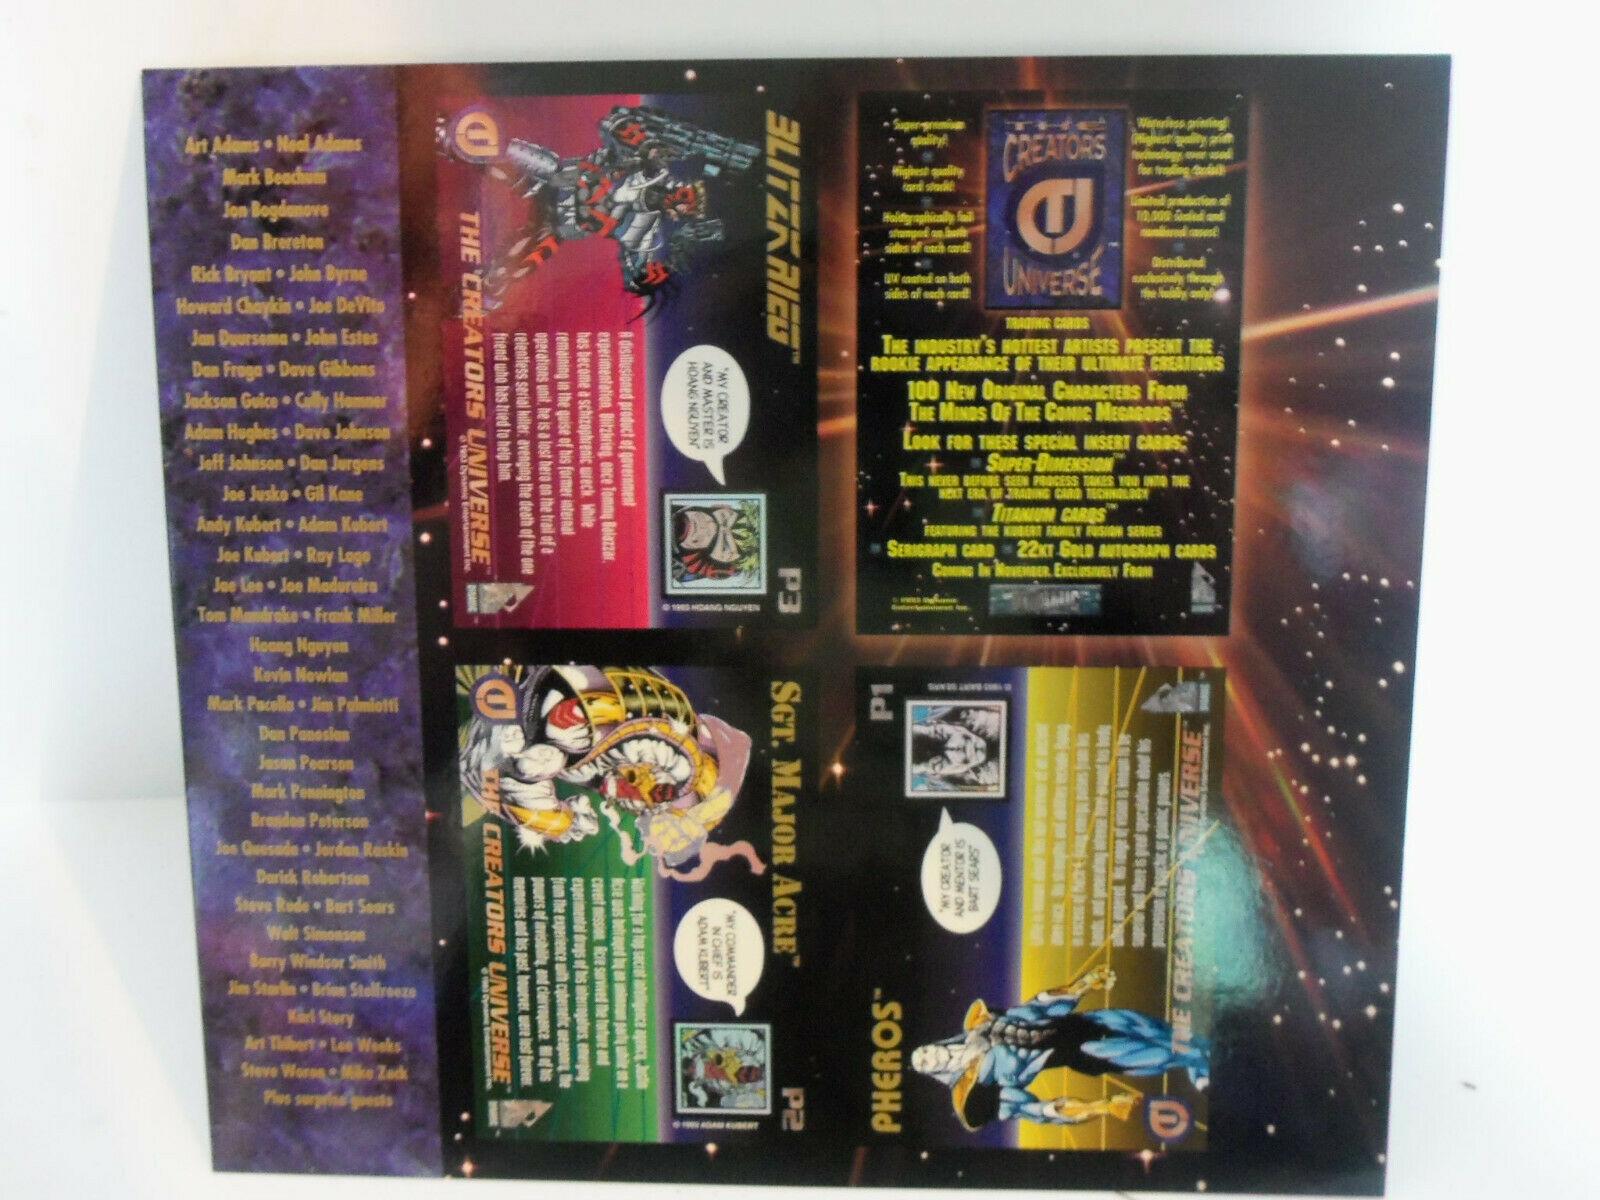 Vintage 1993 CREATOR'S UNIVERSE Uncut PROMO Cards Sheet Kubert Jusko Sears Nguye image 9